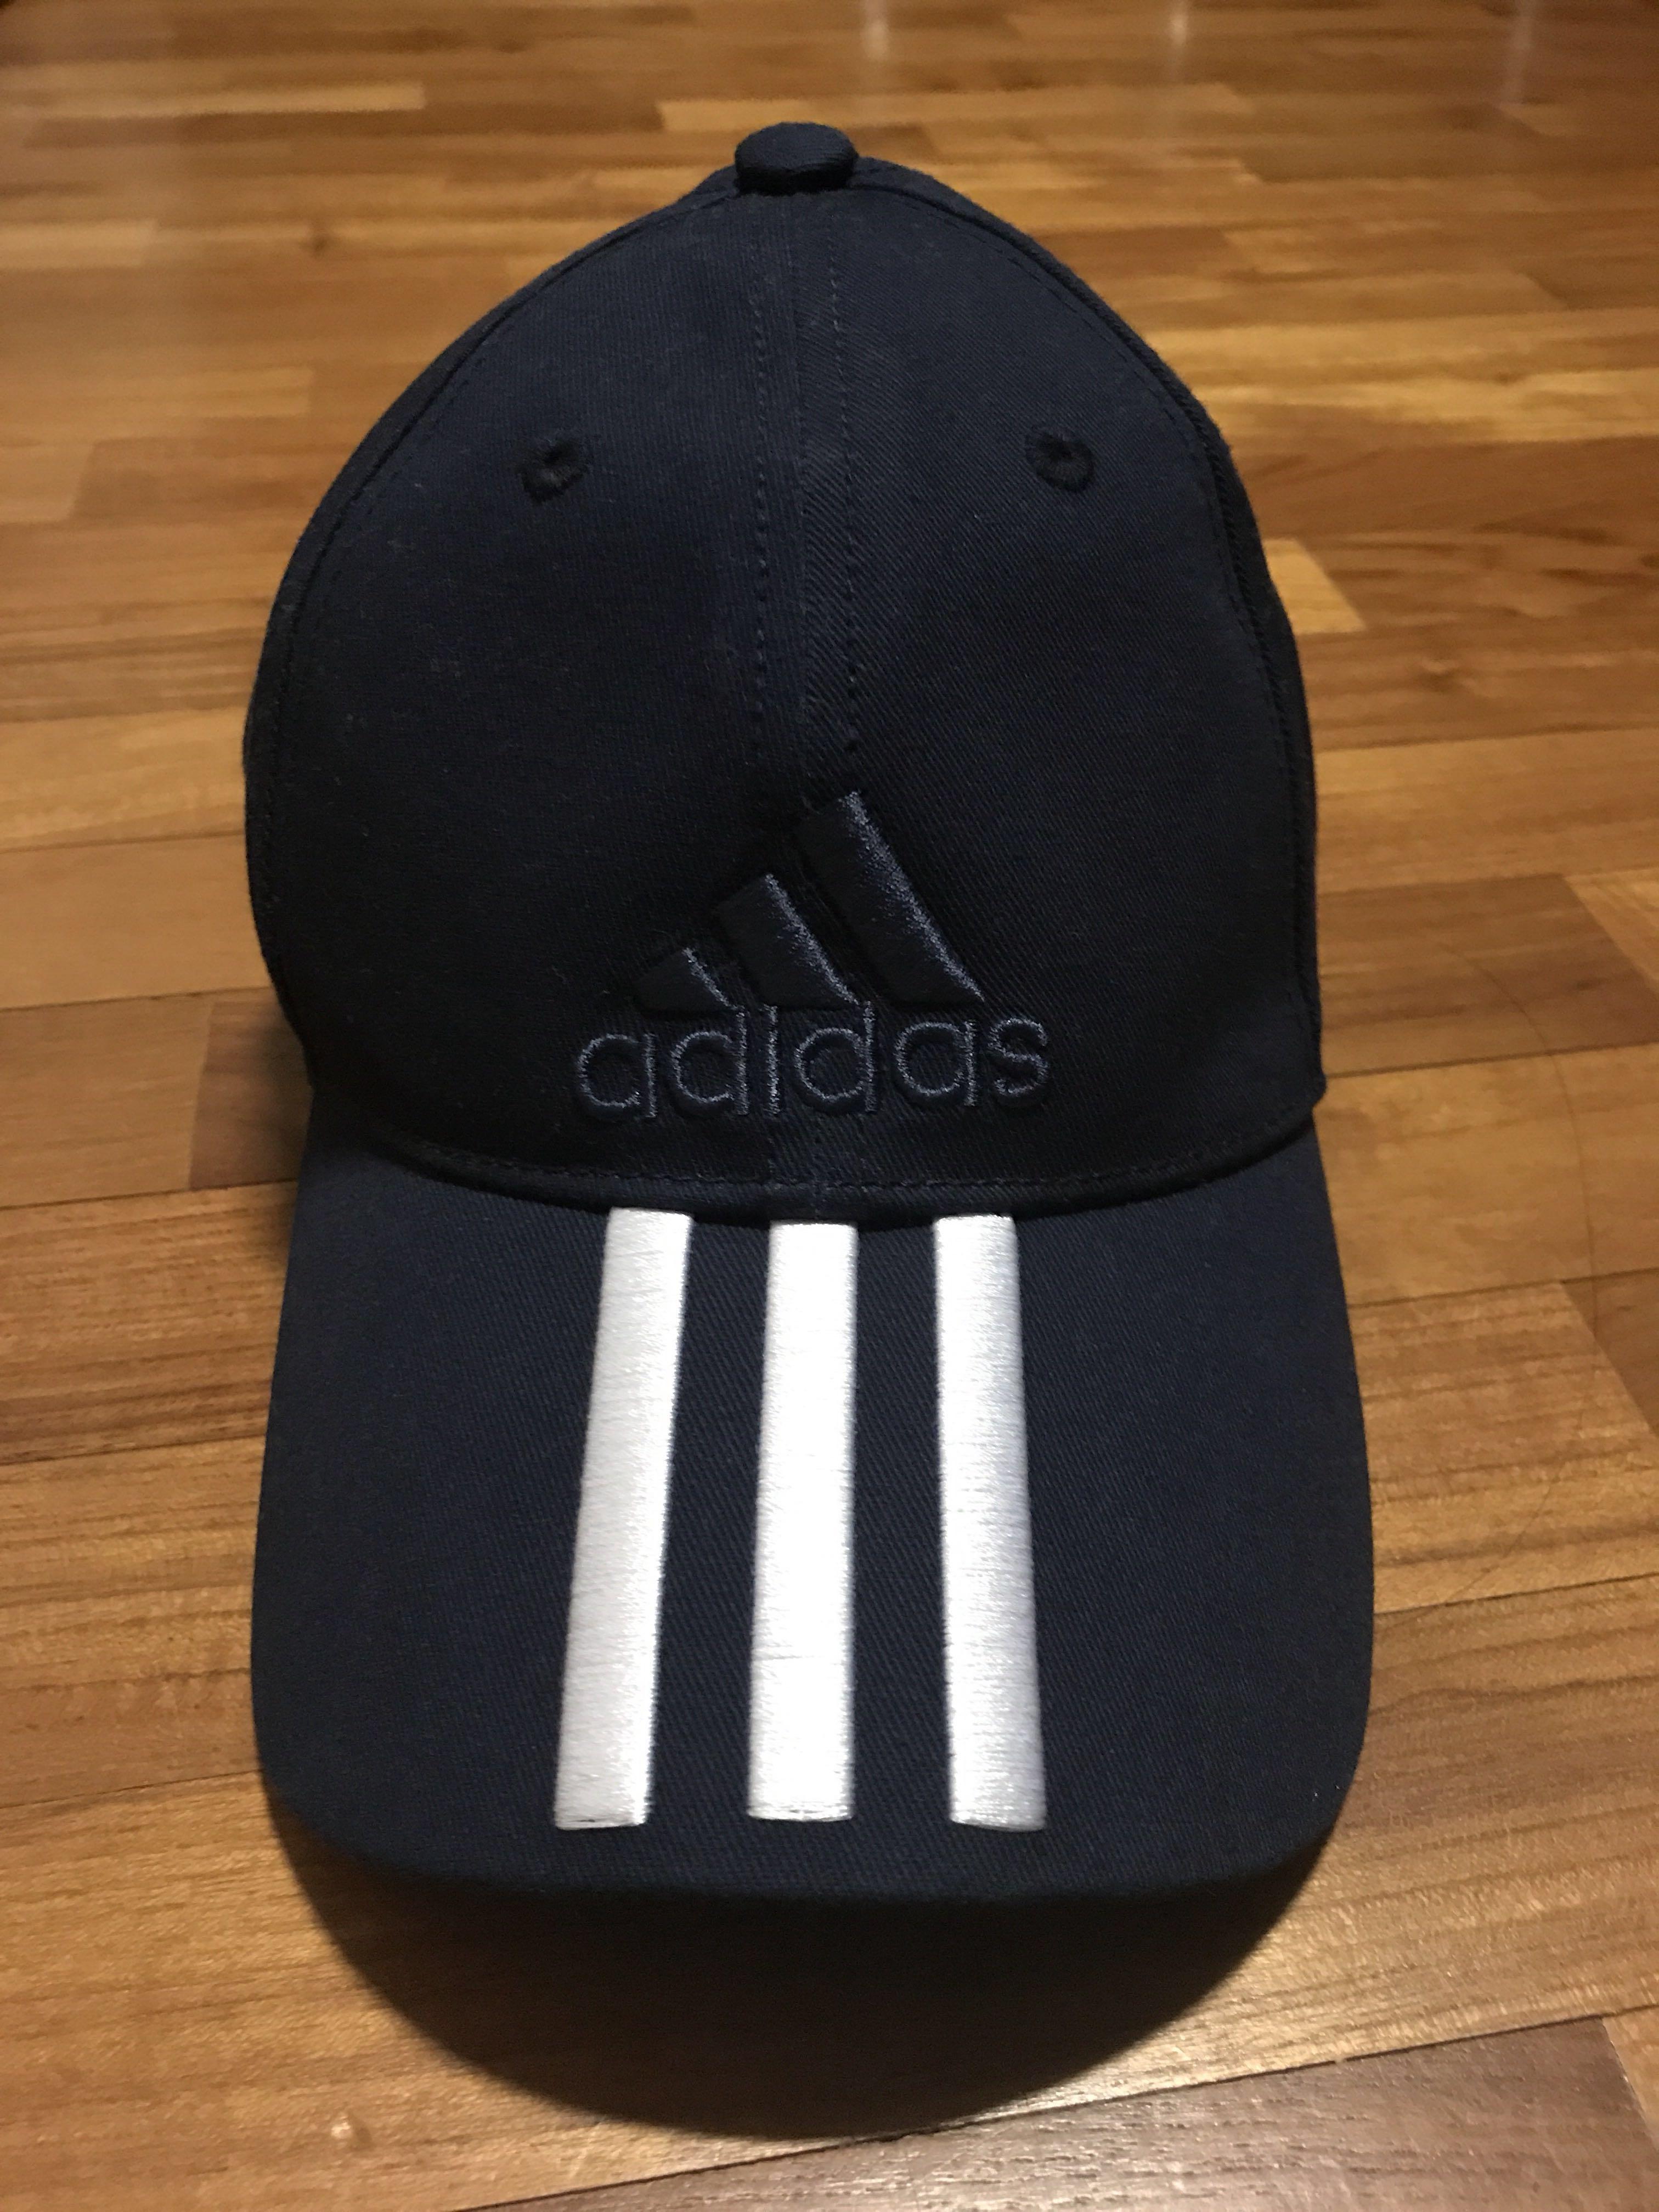 74a7d097fc3a1 Authentic Adidas Cap (Navy Blue)